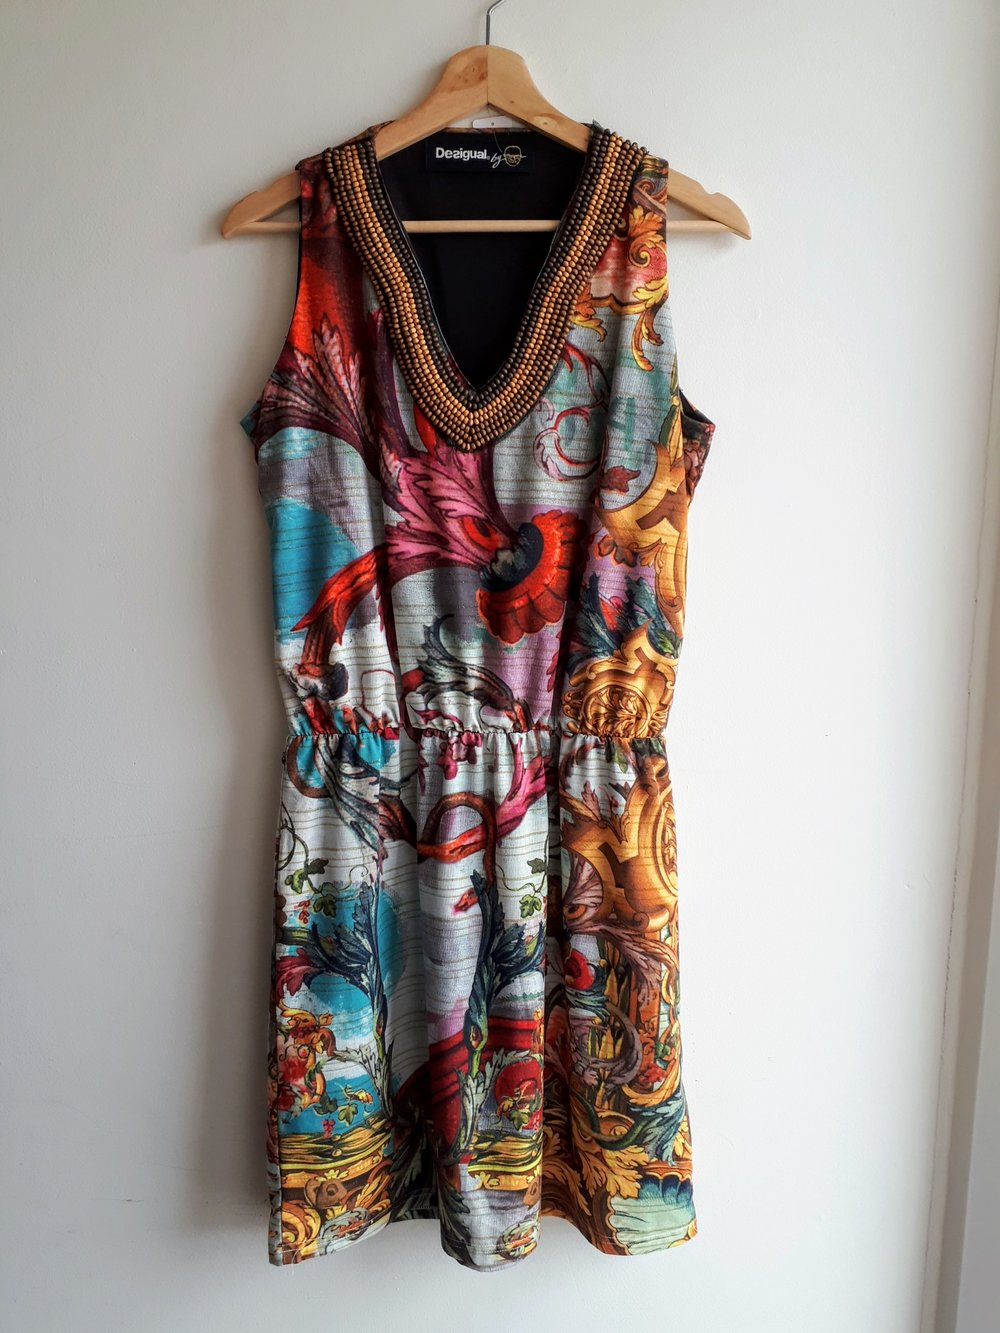 Desigual dress; Size M, $40